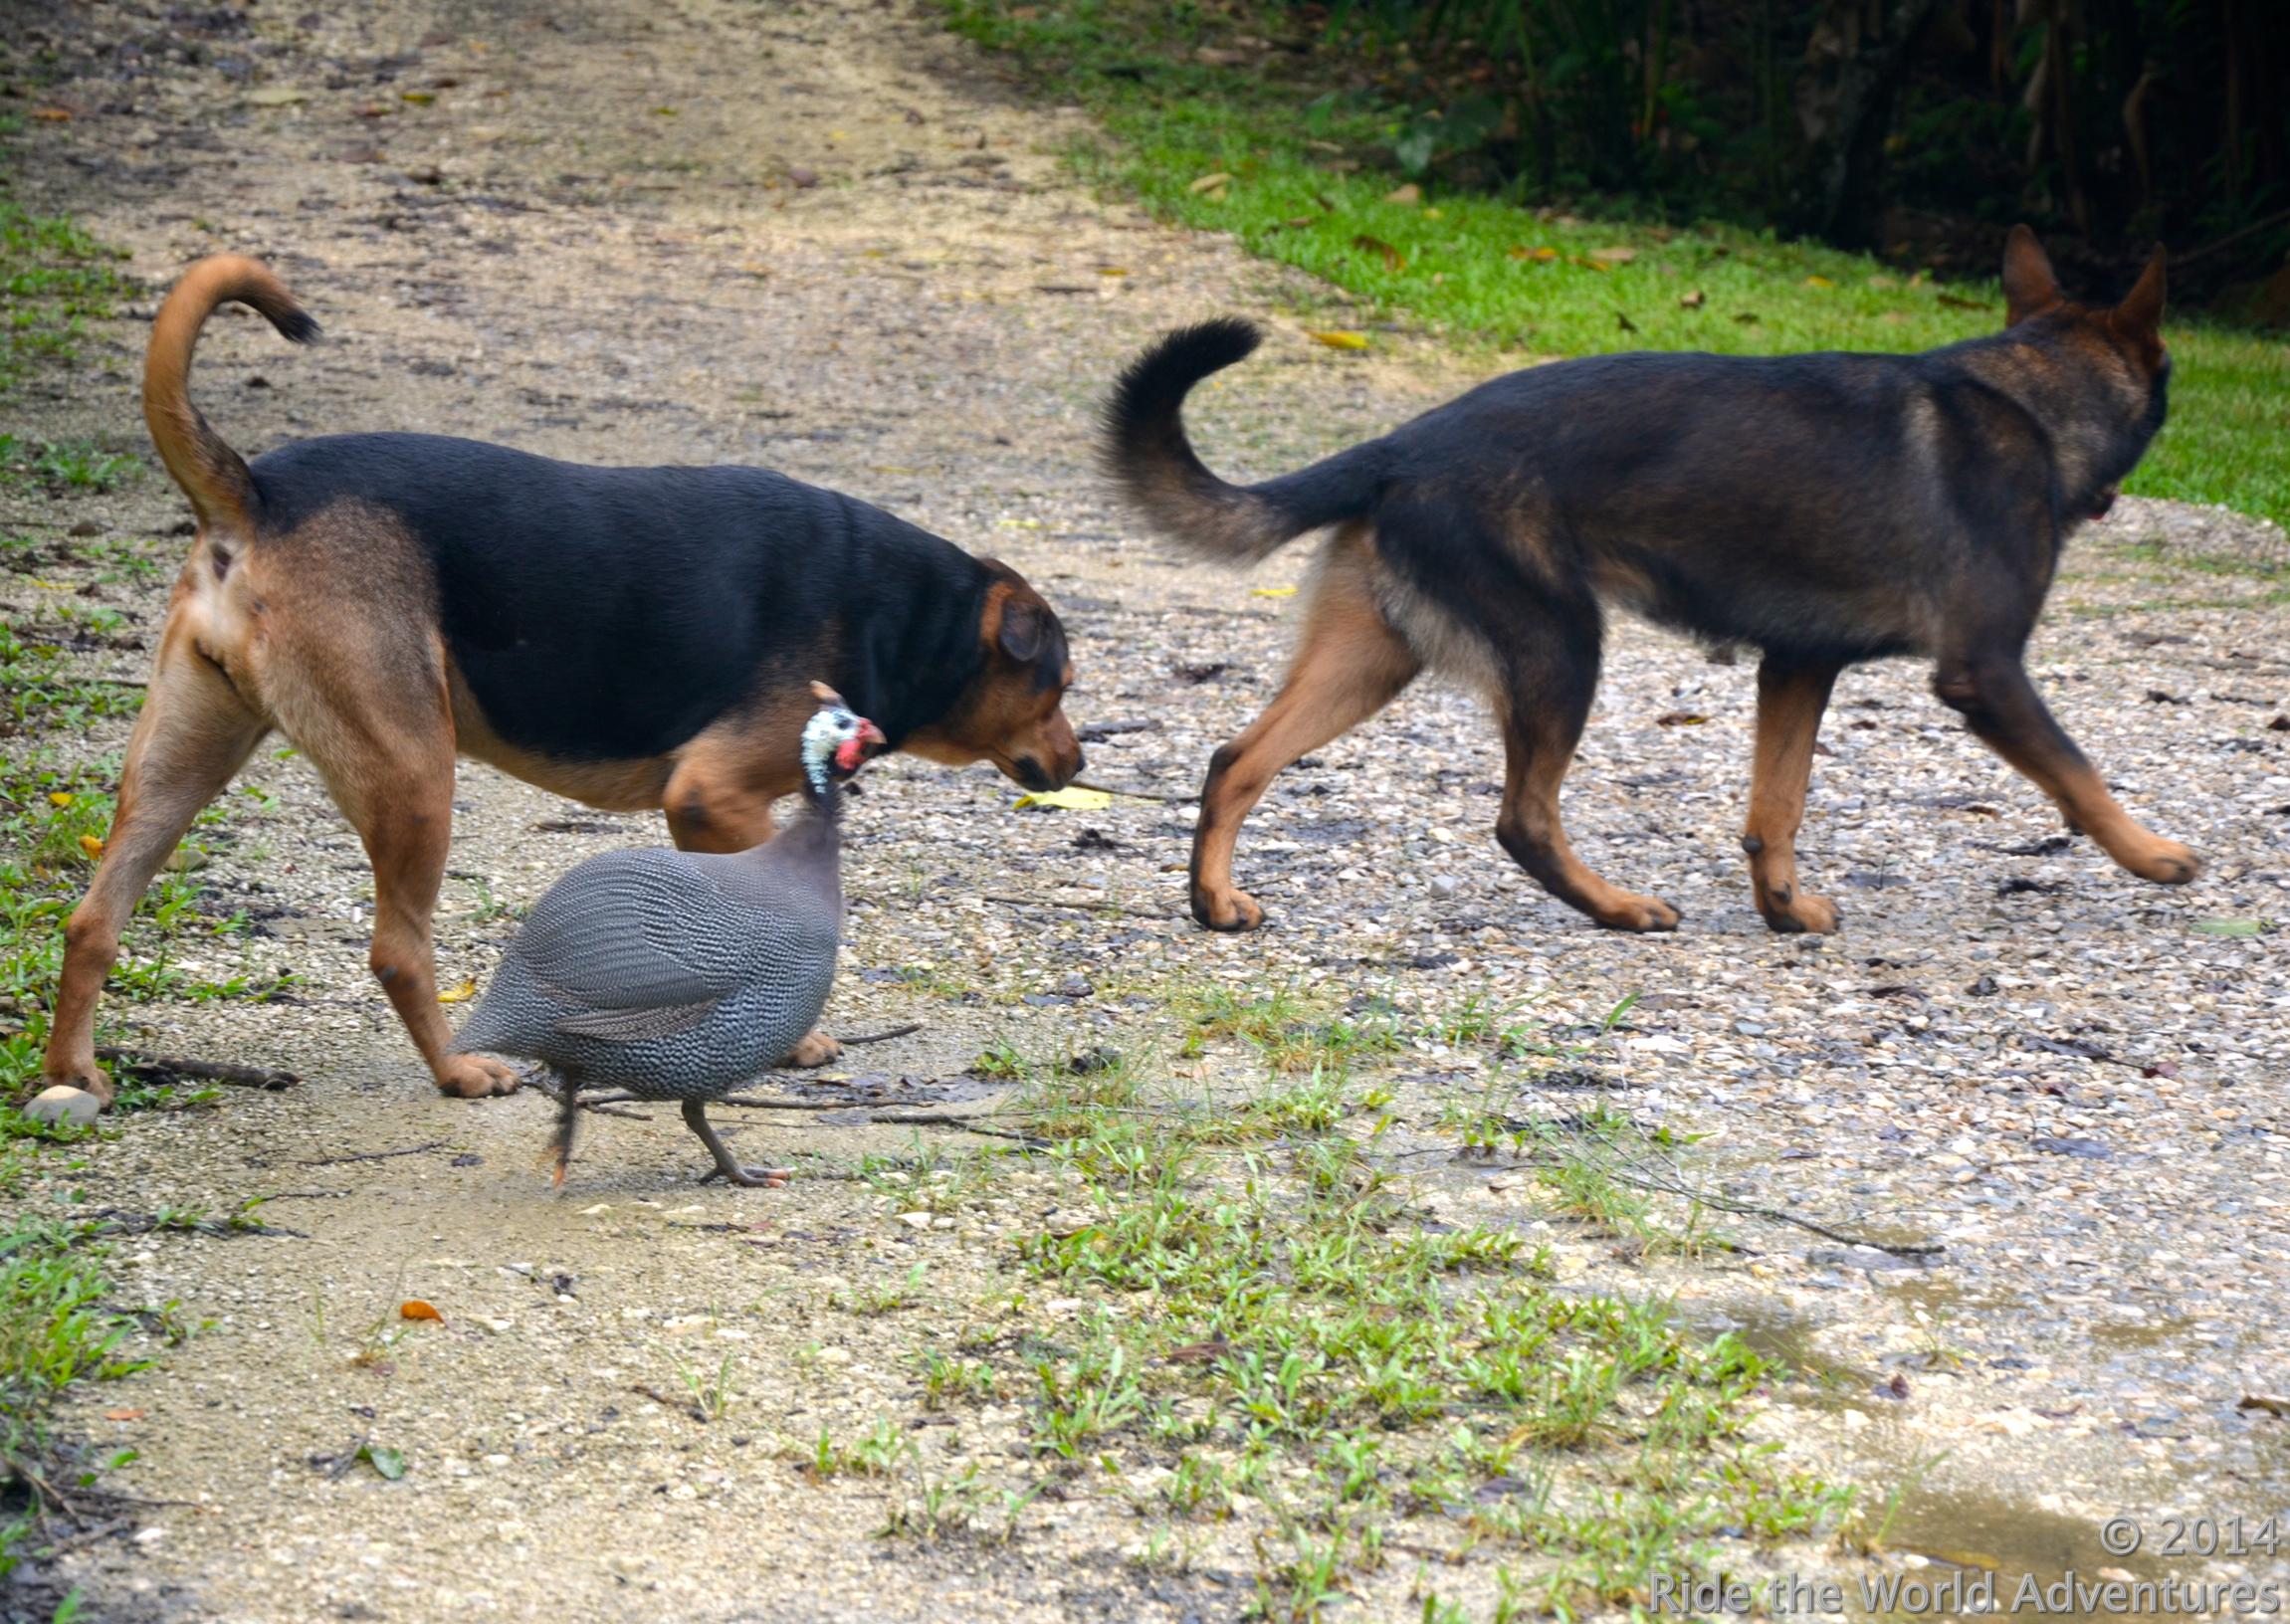 Pec, Digby & Peep